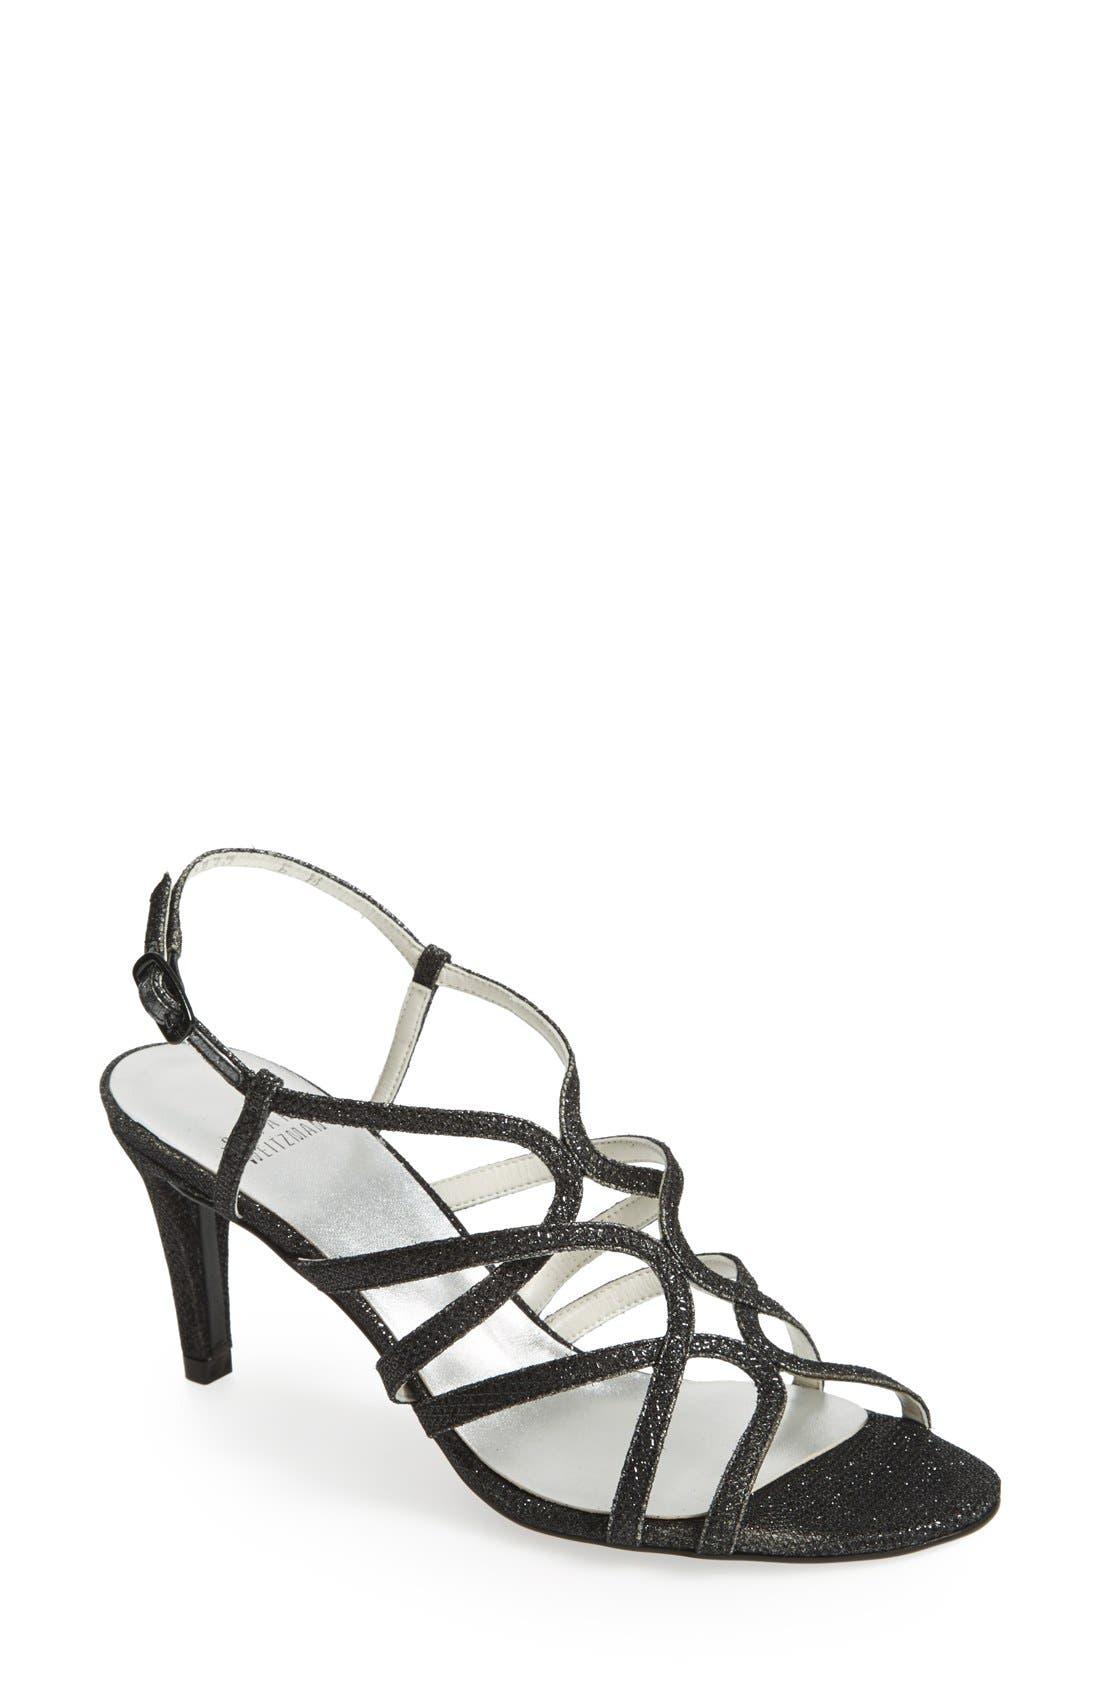 STUART WEITZMAN 'Turningup' Sandal, Main, color, 004